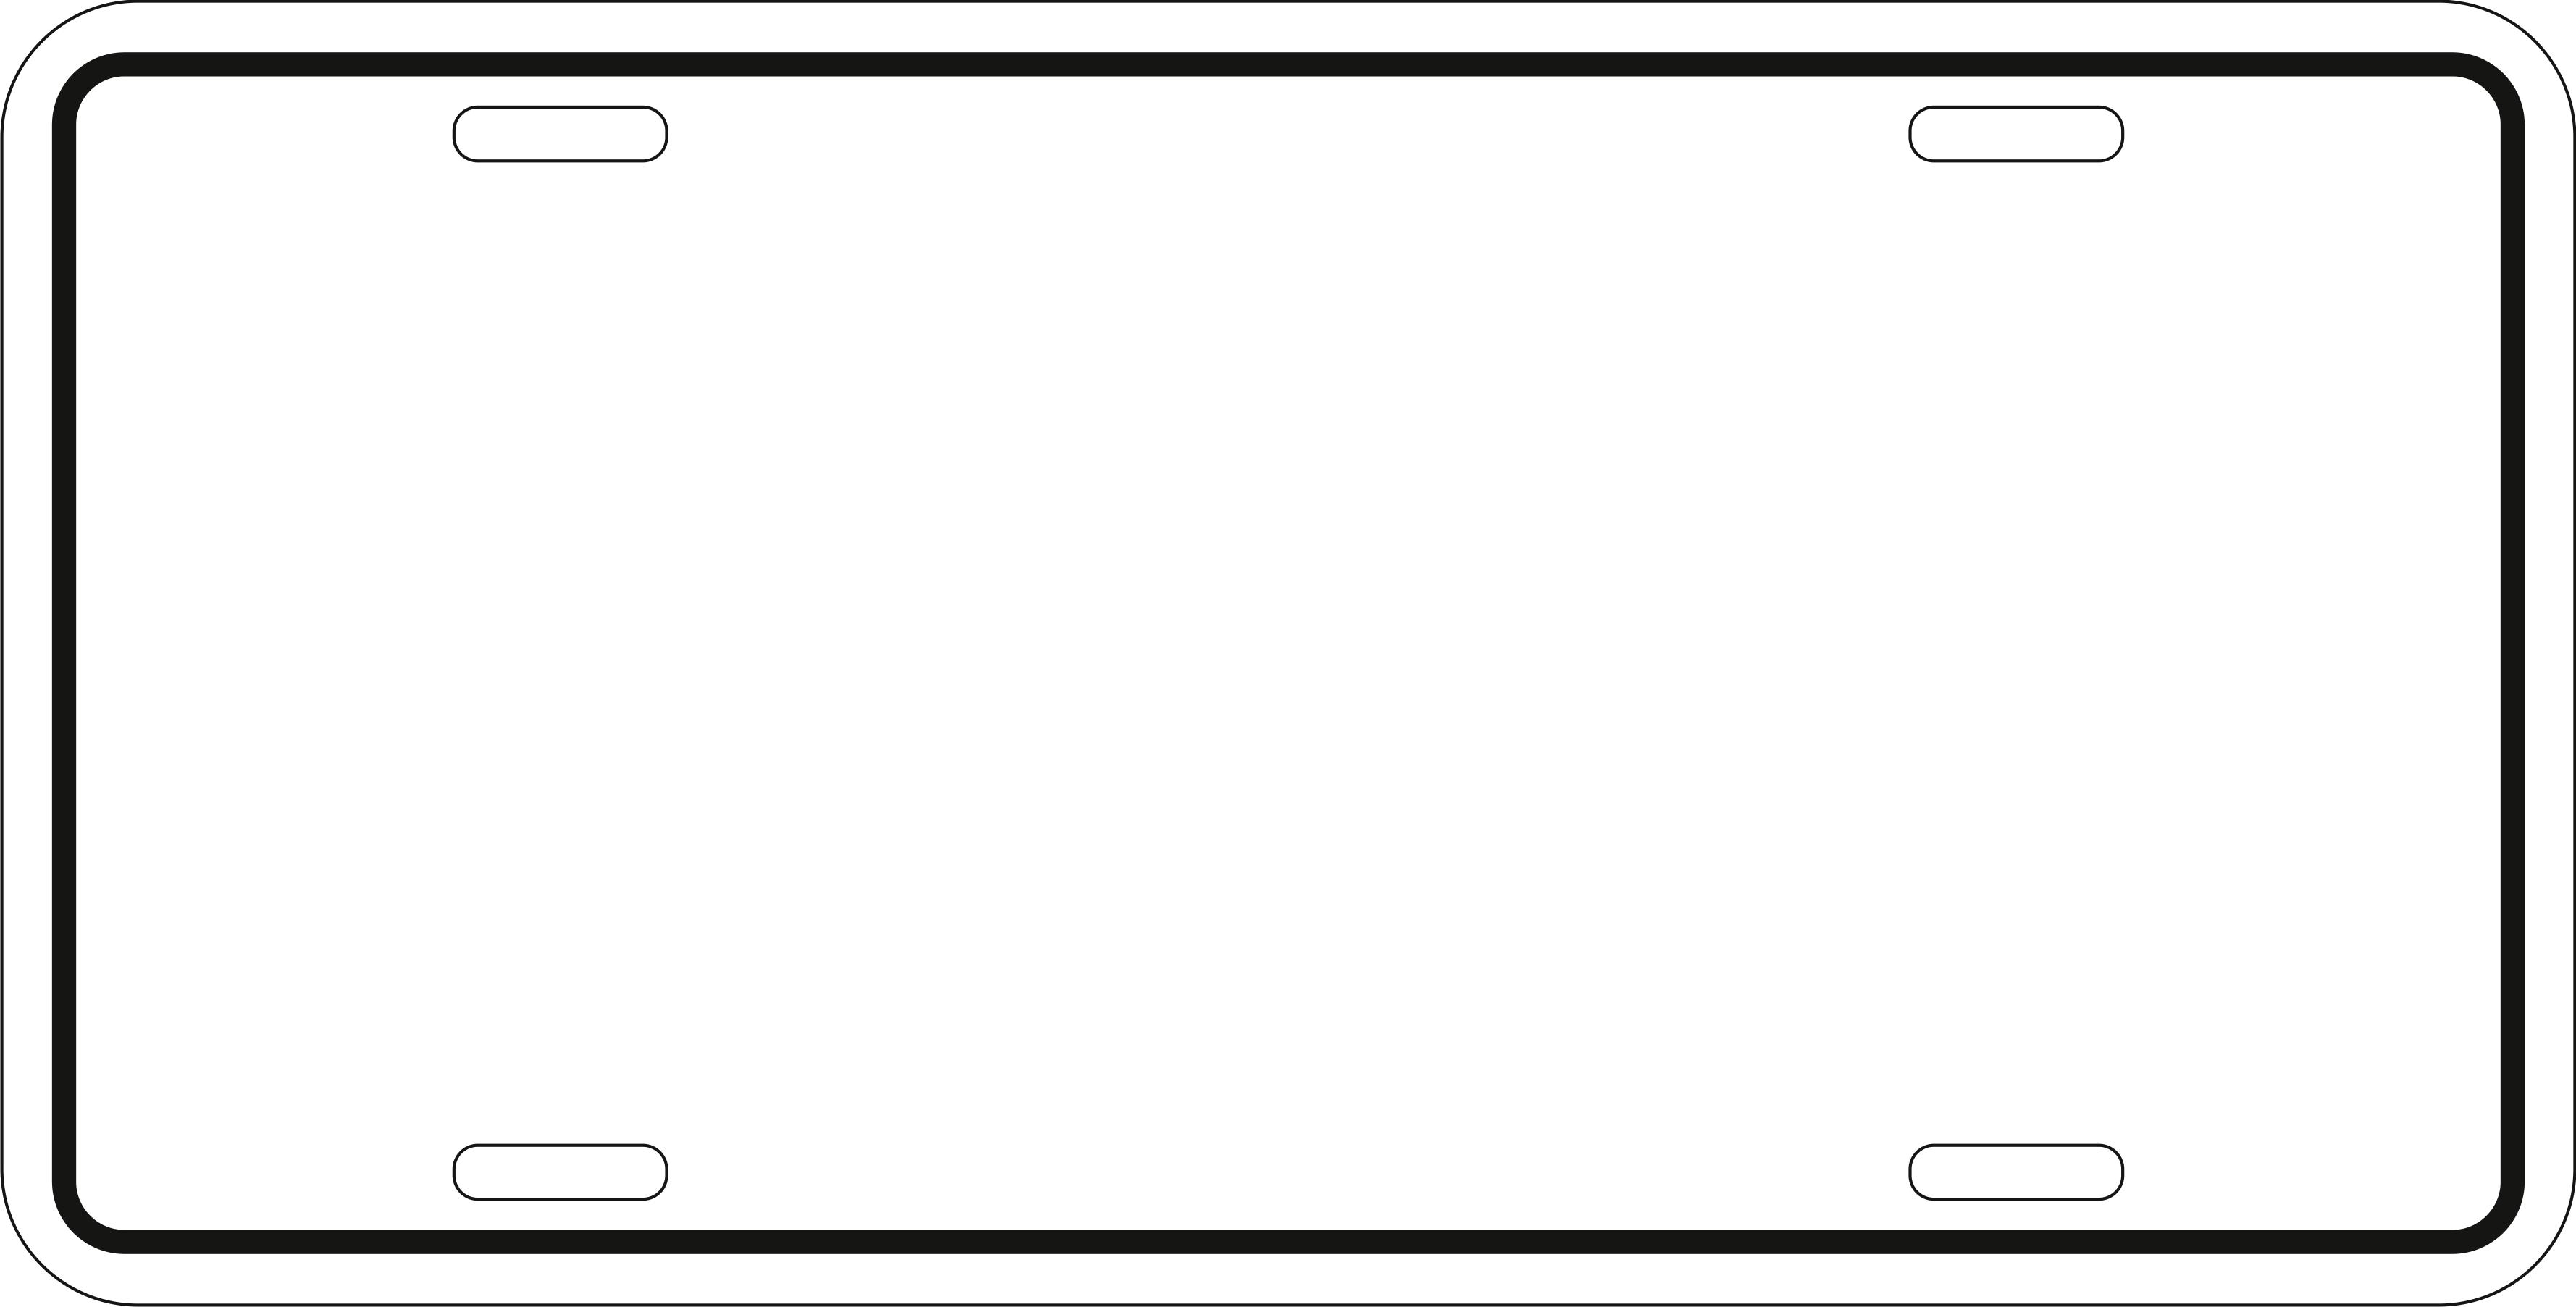 printable license plate template.